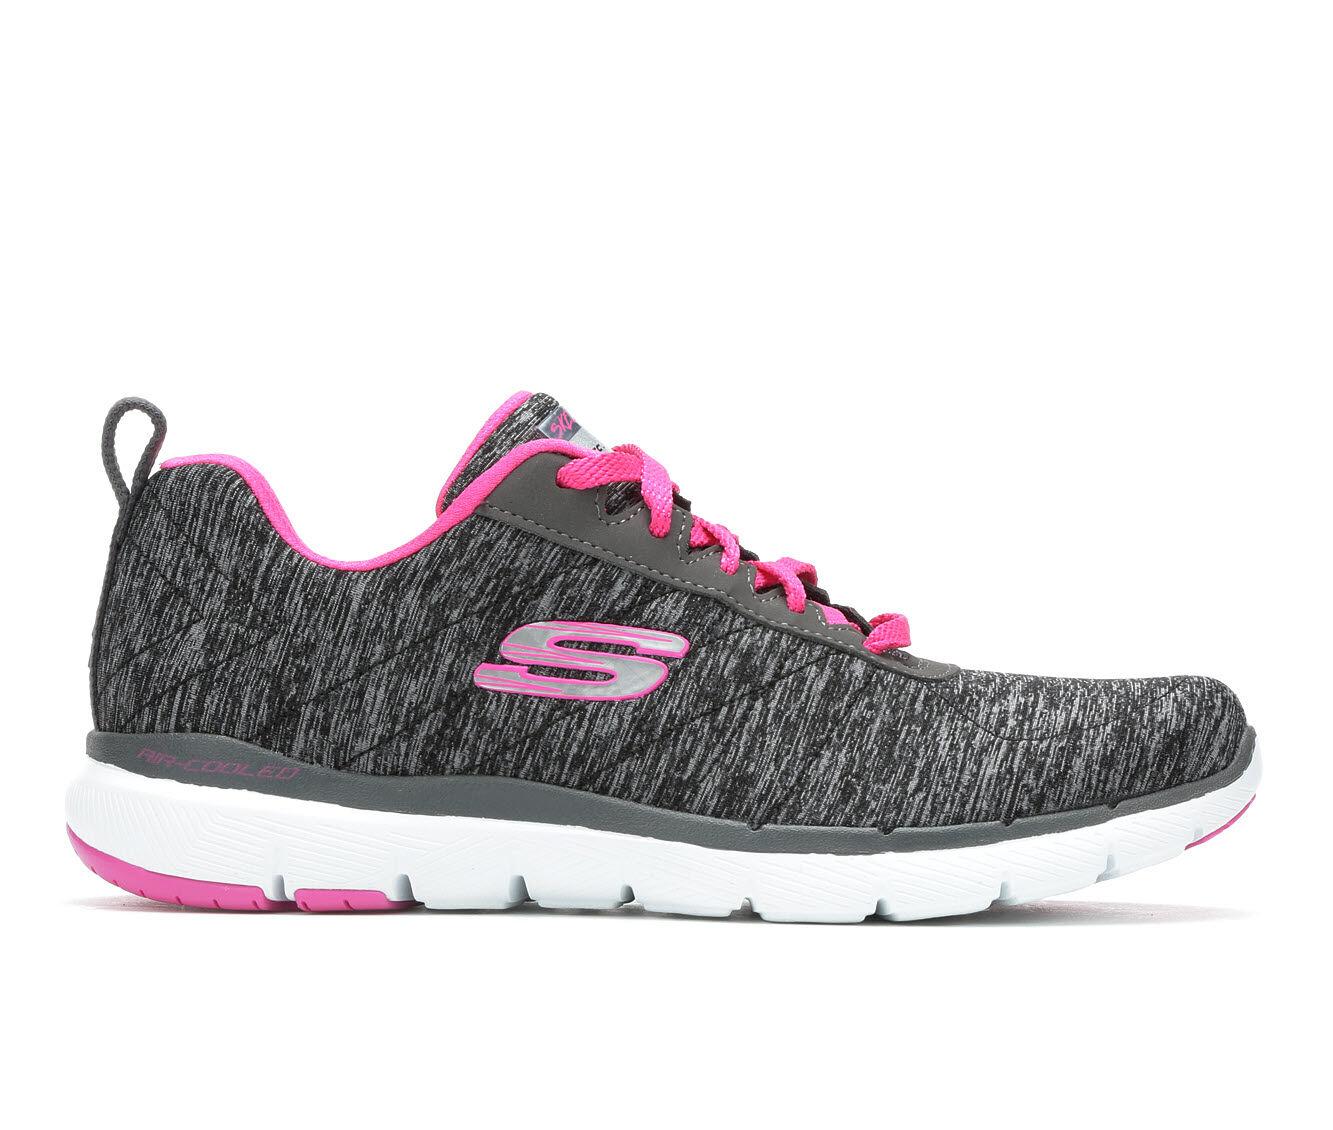 find cheapest Women's Skechers Insiders 13067 Sneakers Black/Grey/Pink